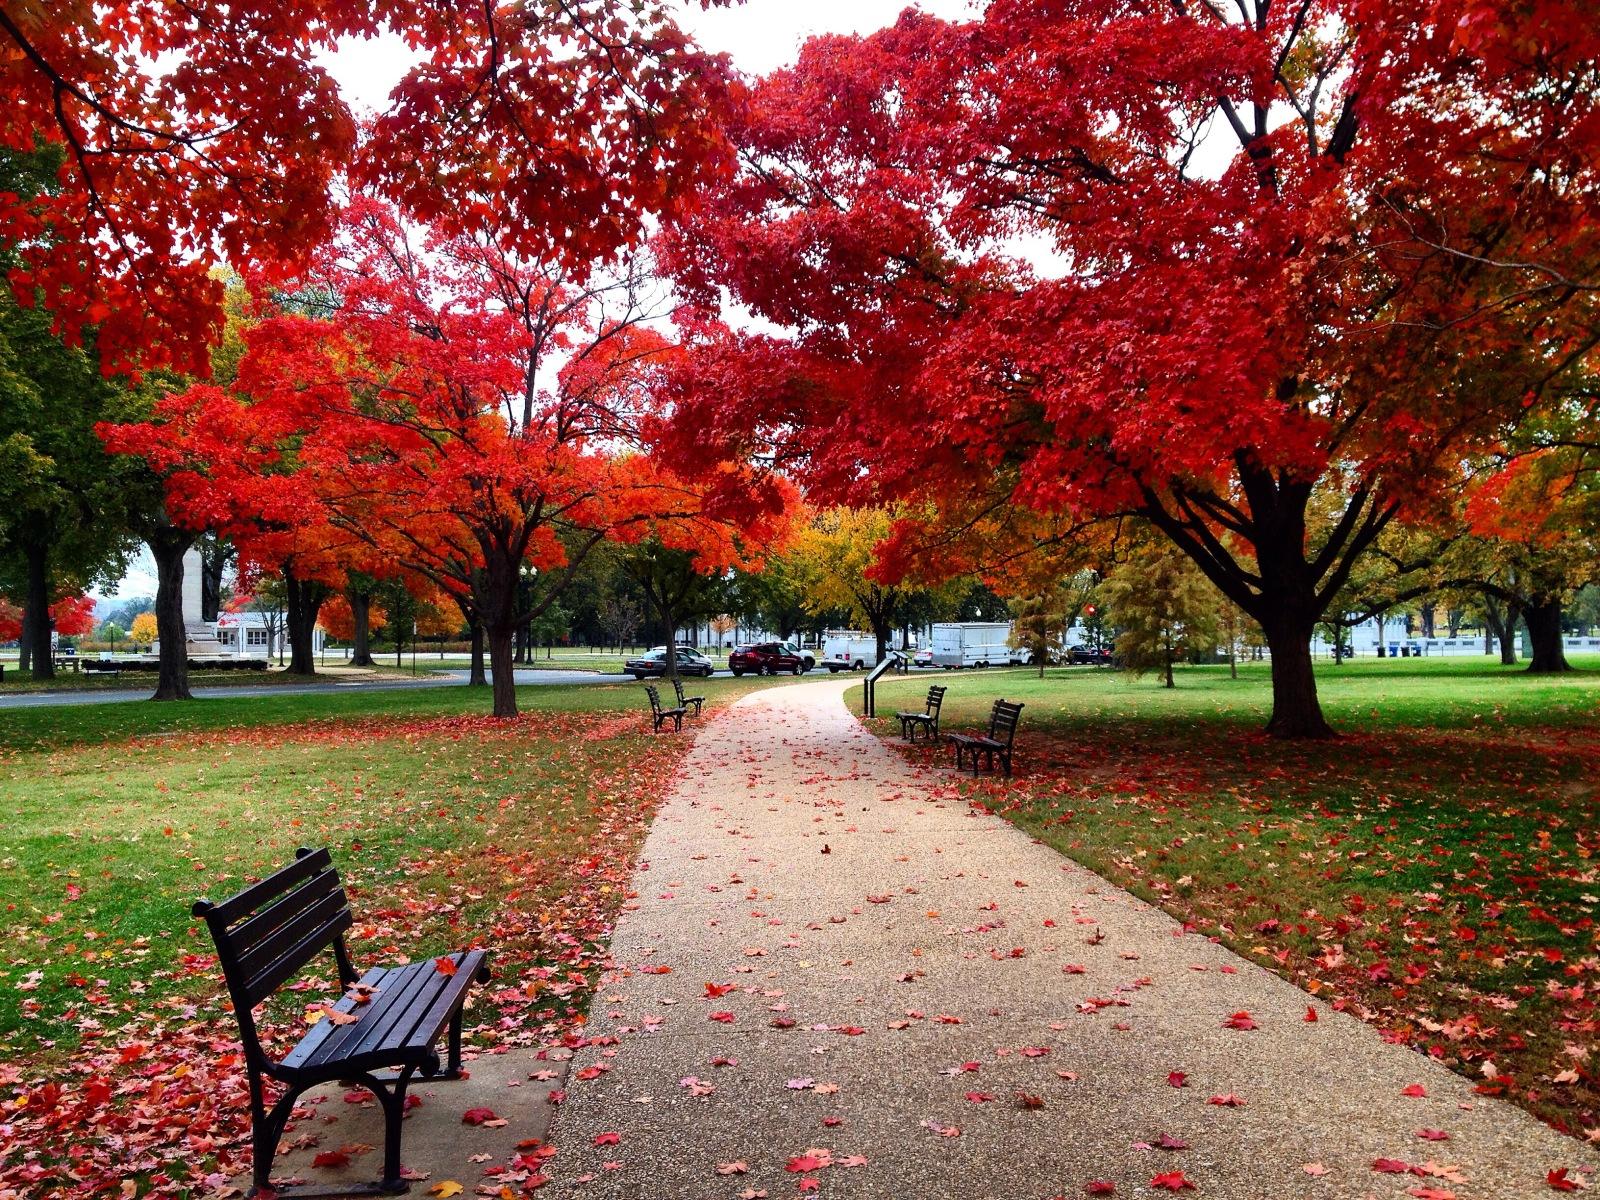 Fall leaves in D.C.